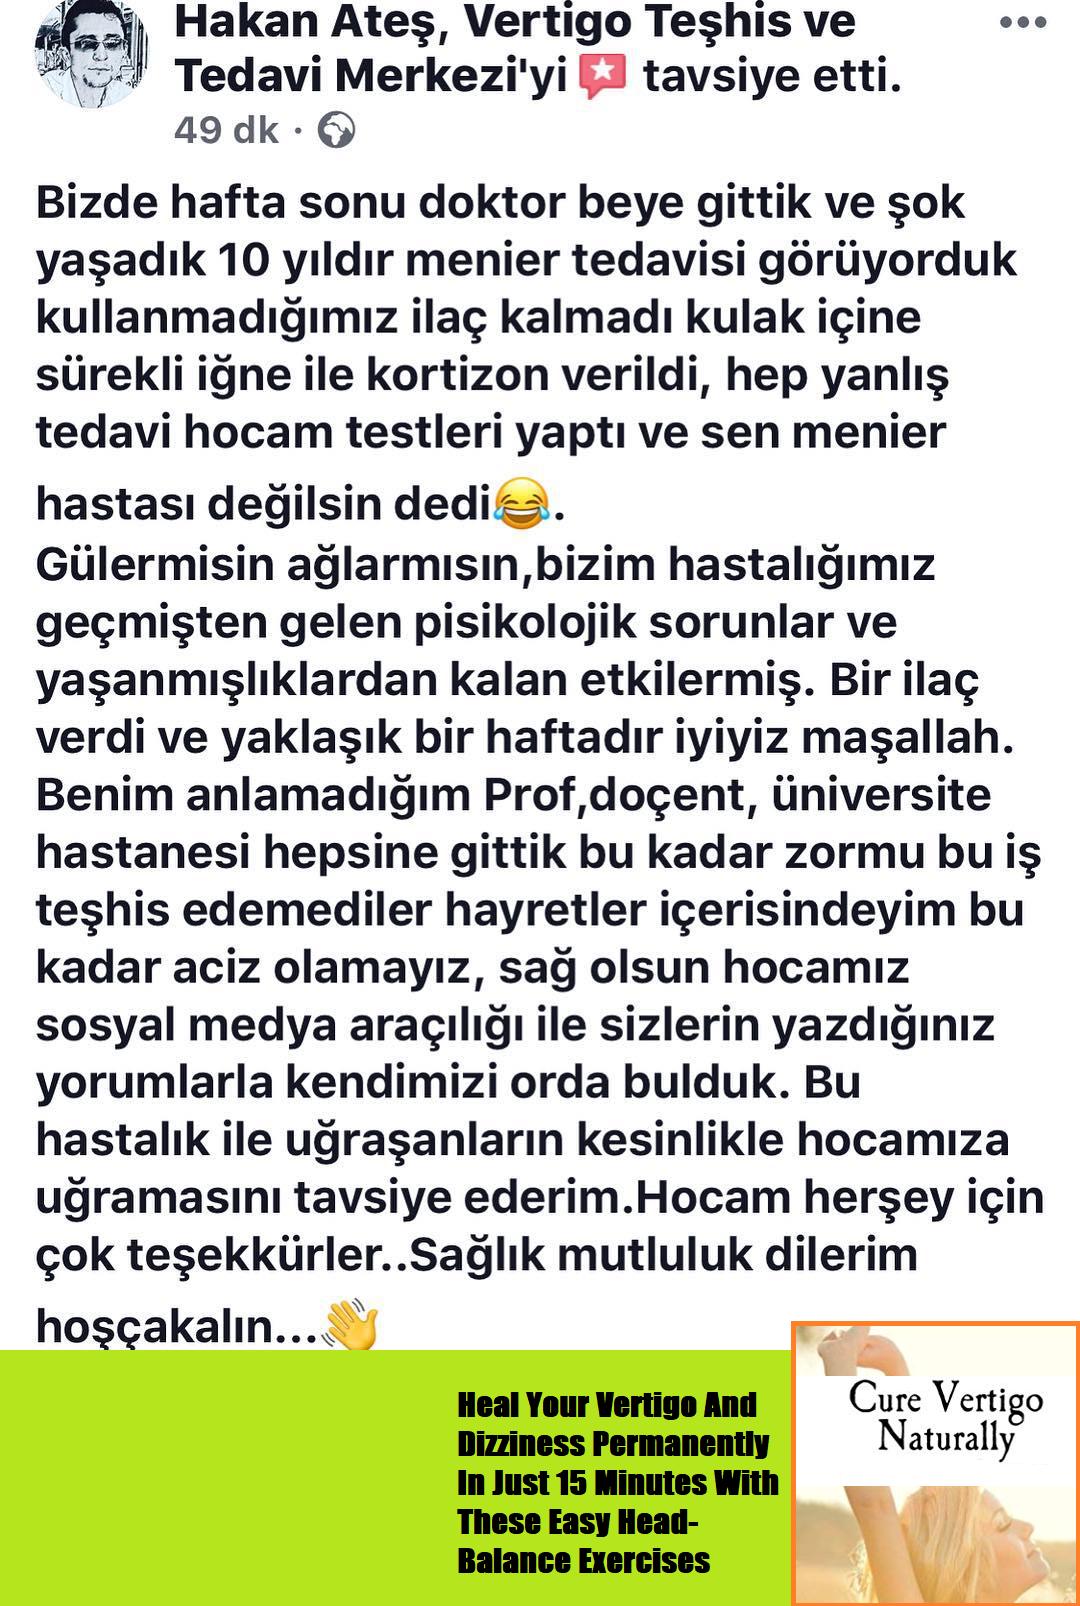 Prof.Dr.Mehmet Yavuz Sutbeyaz Vertigo Teshis ve Tedavi Merkezi 0216 350  1122 www.myavuzsutbeyaz.com #meniere #vertigoilacl… | Vertigo, Just deal  with it, Overcoming